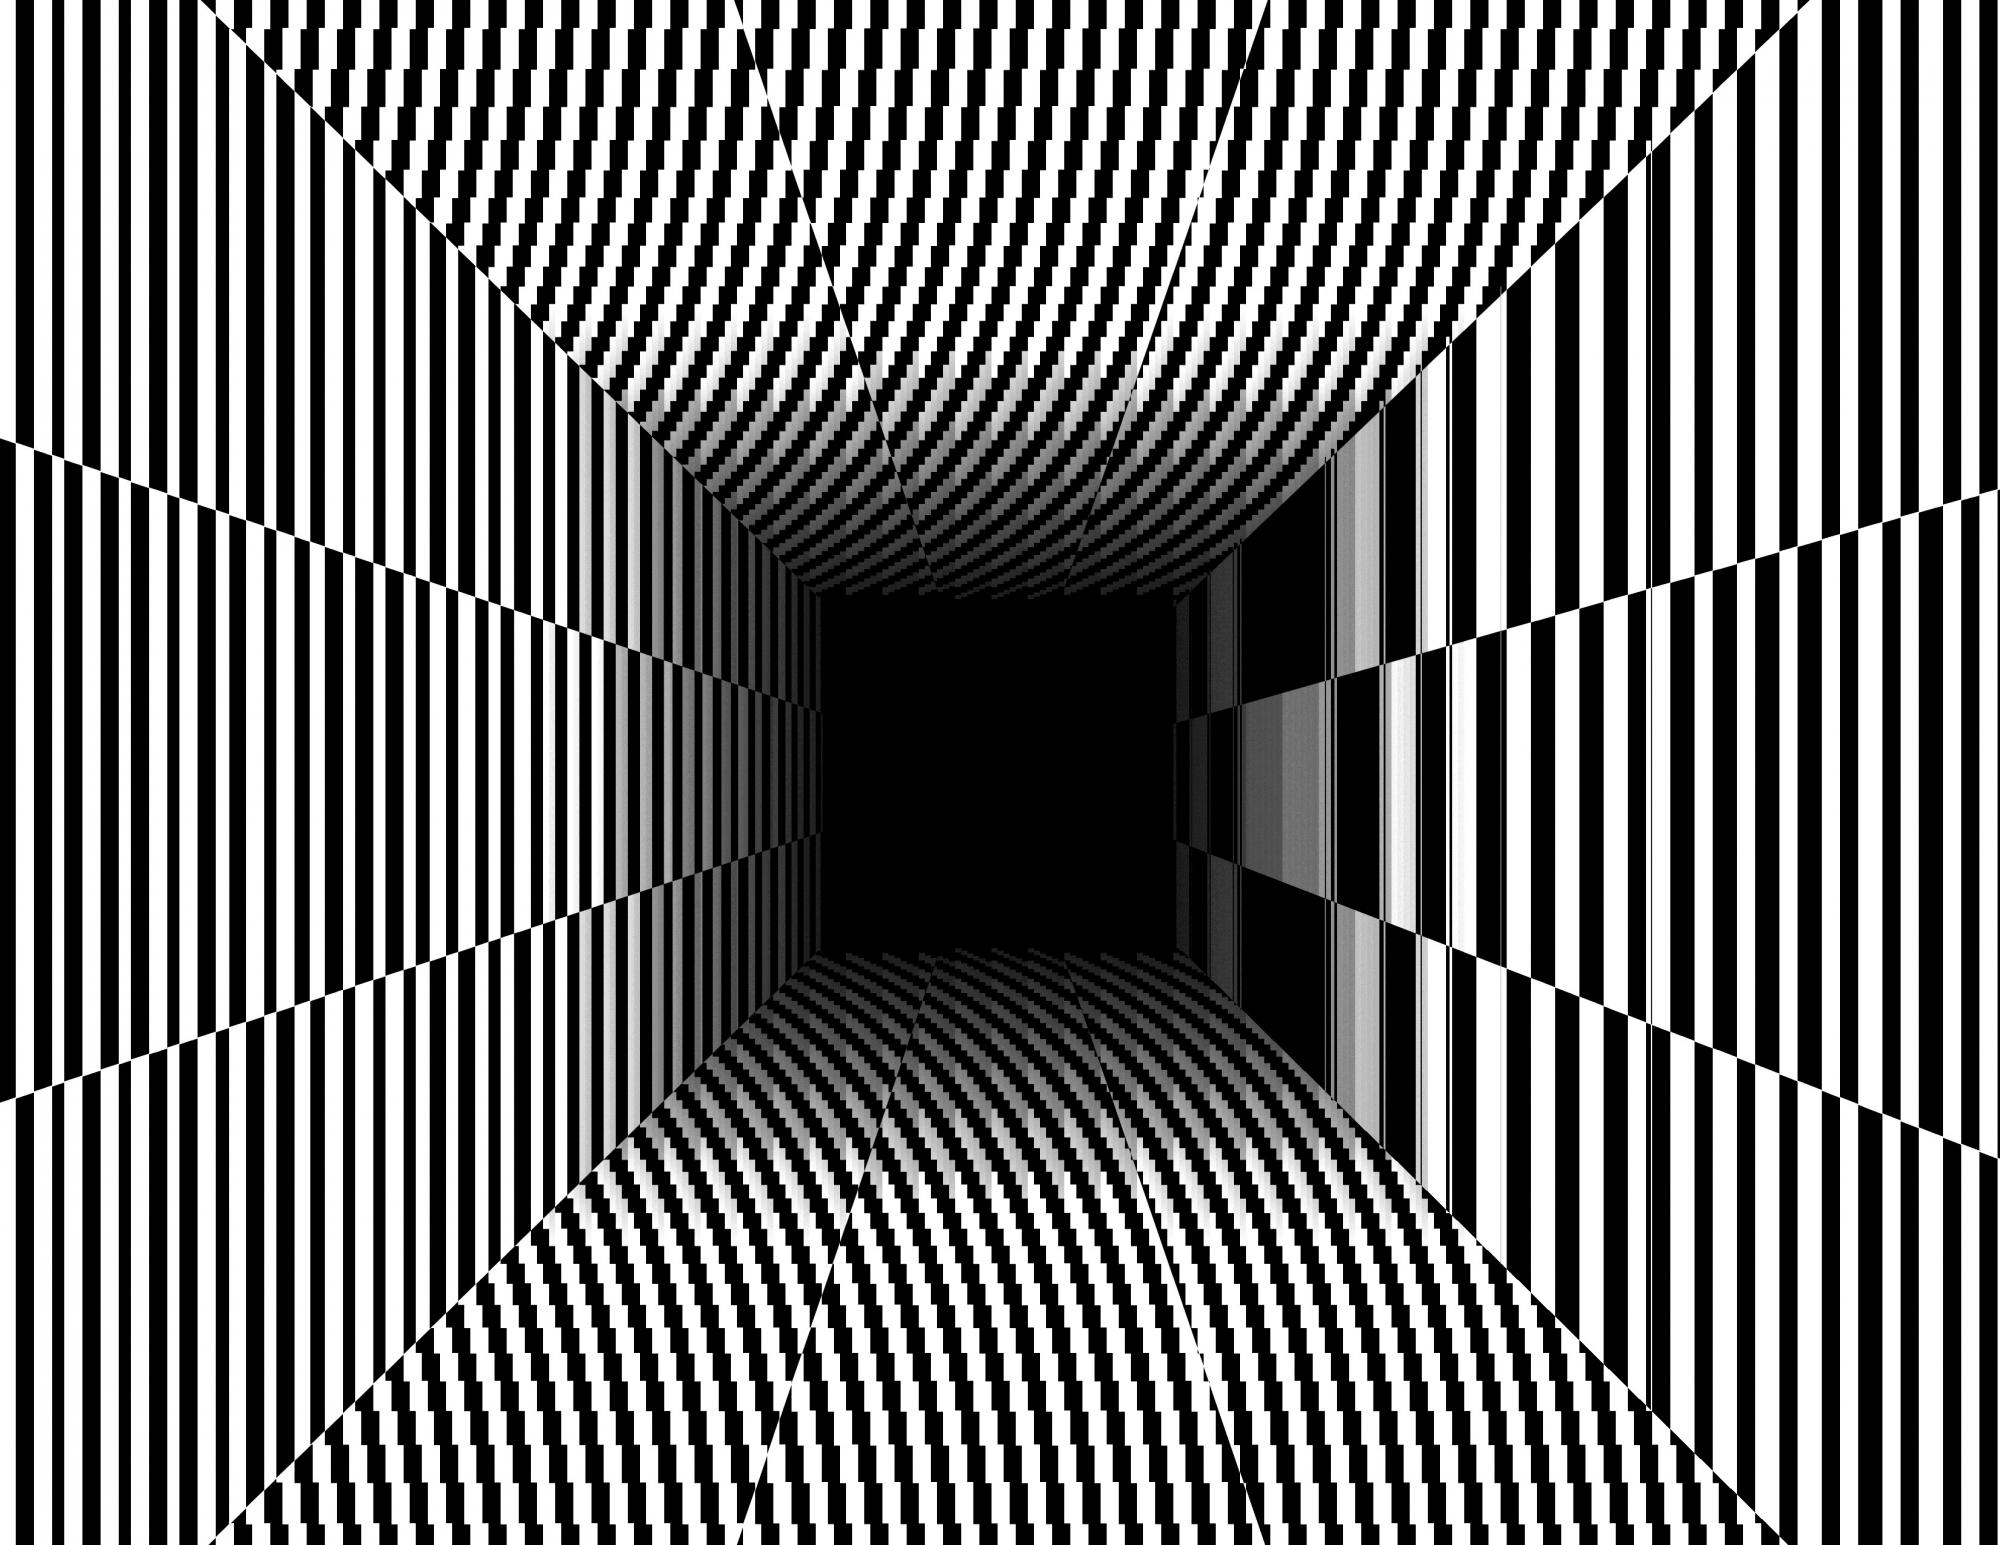 Супер картинки иллюзии